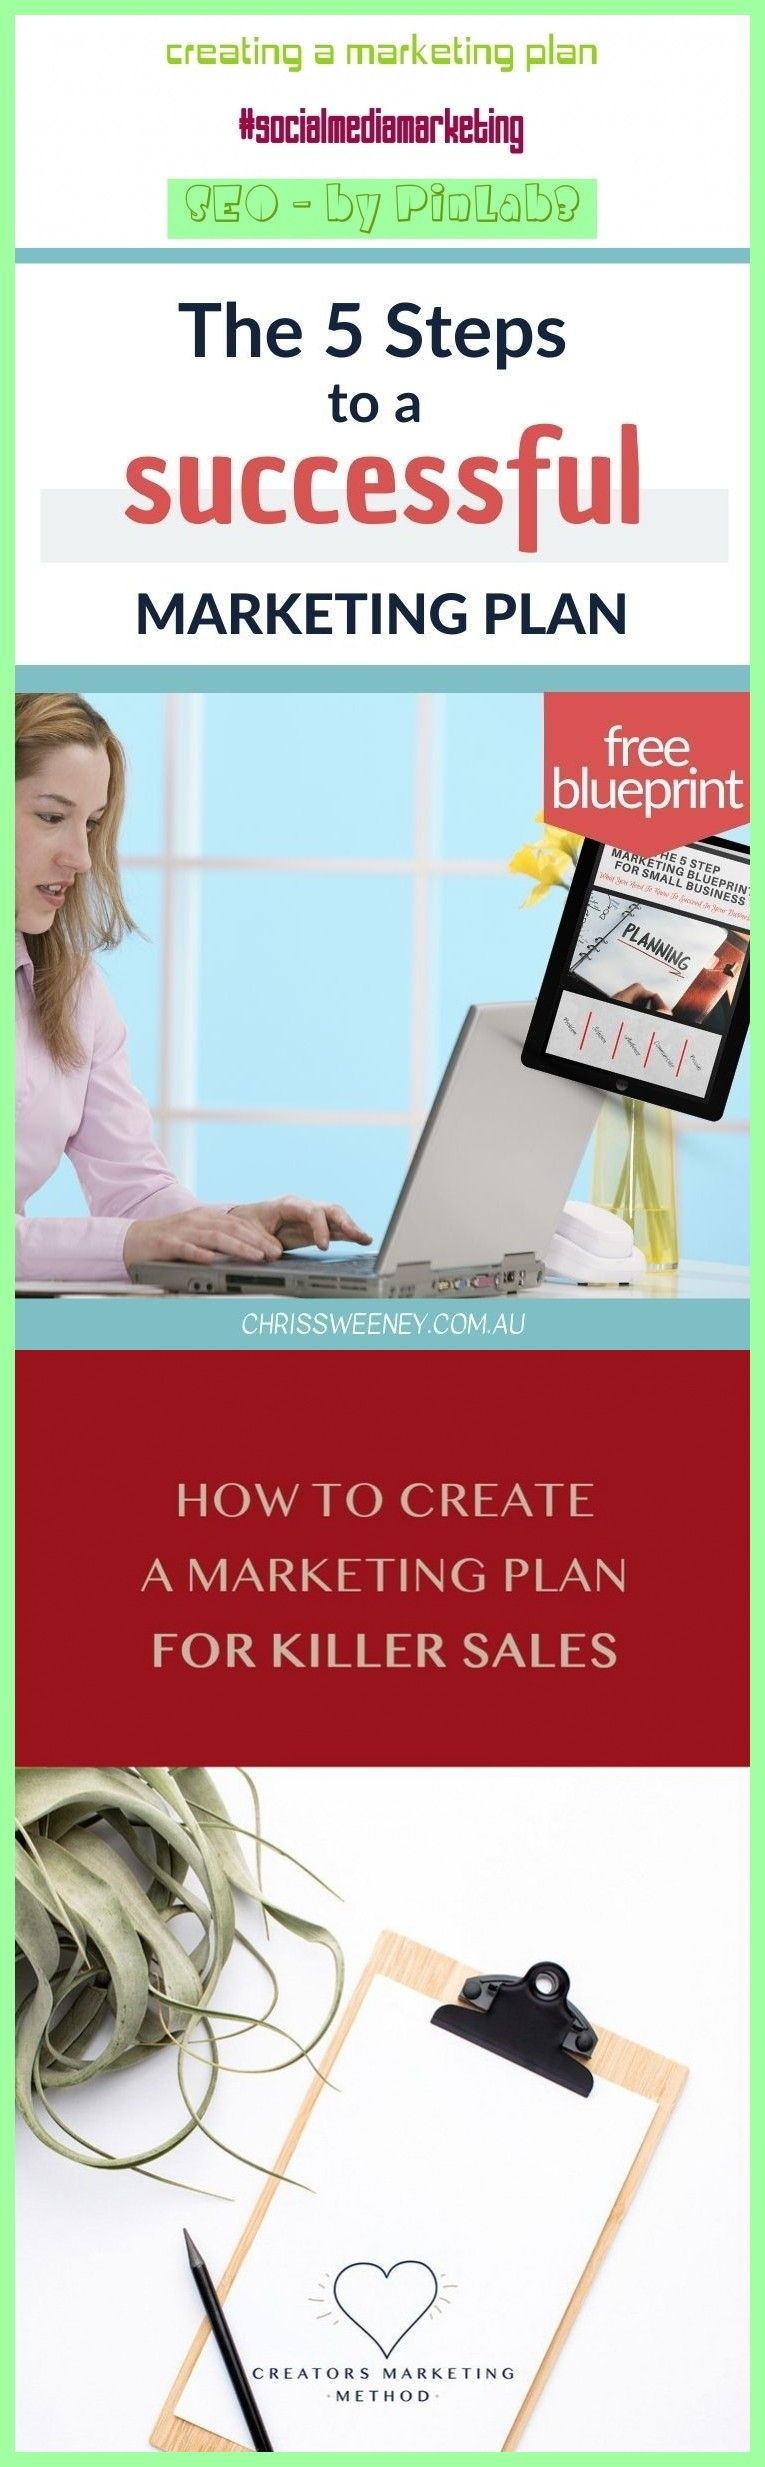 Creating a marketing plan creating marketing erstellen